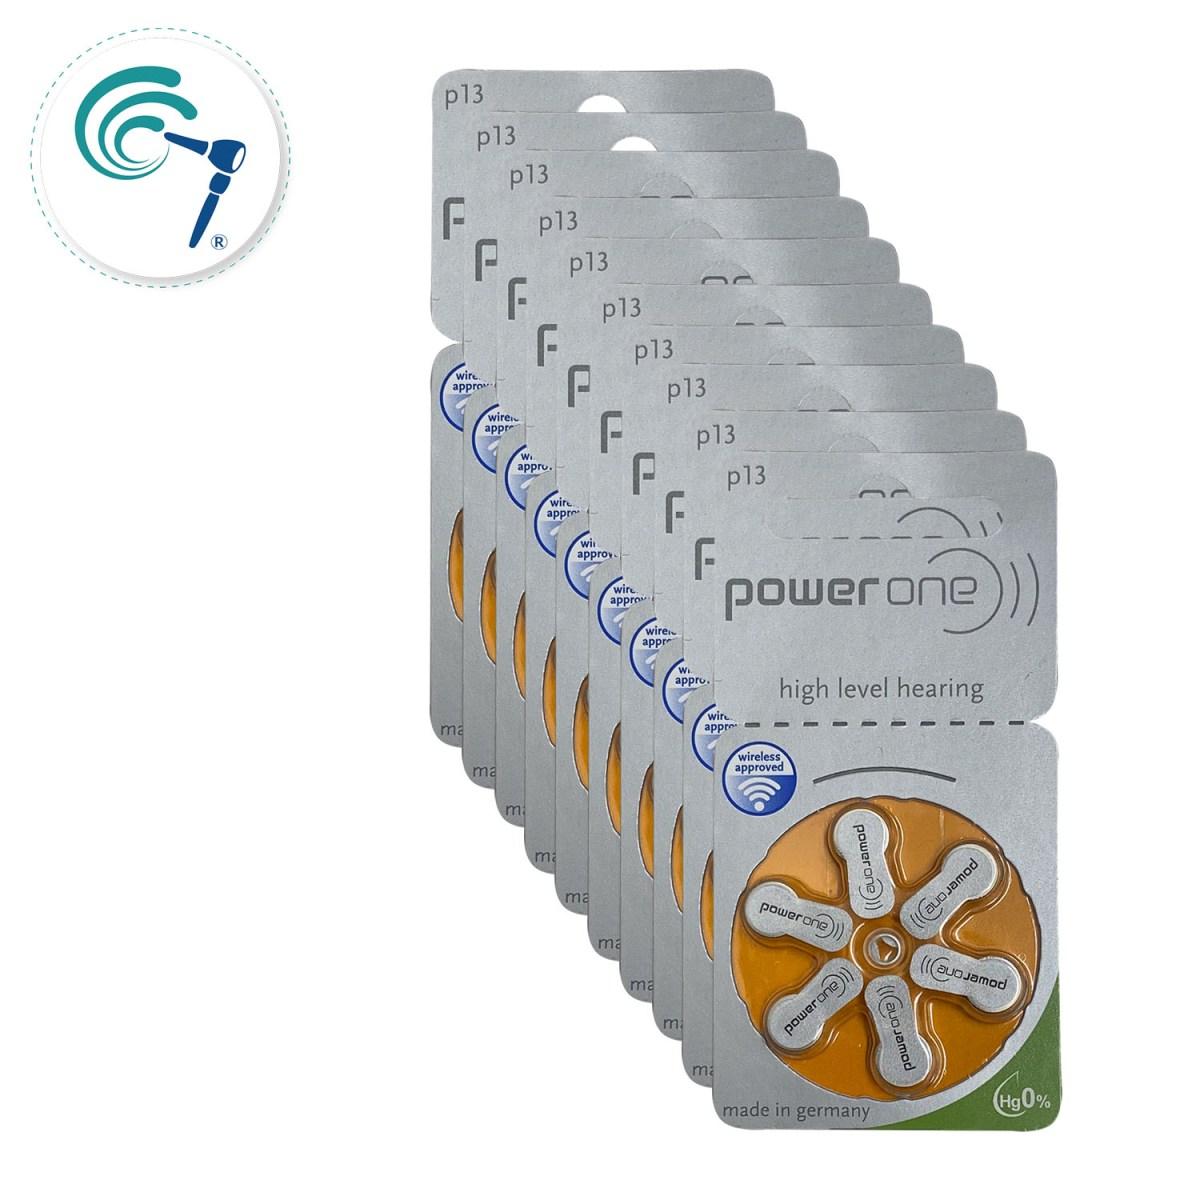 Pilas para implante coclear PowerOne